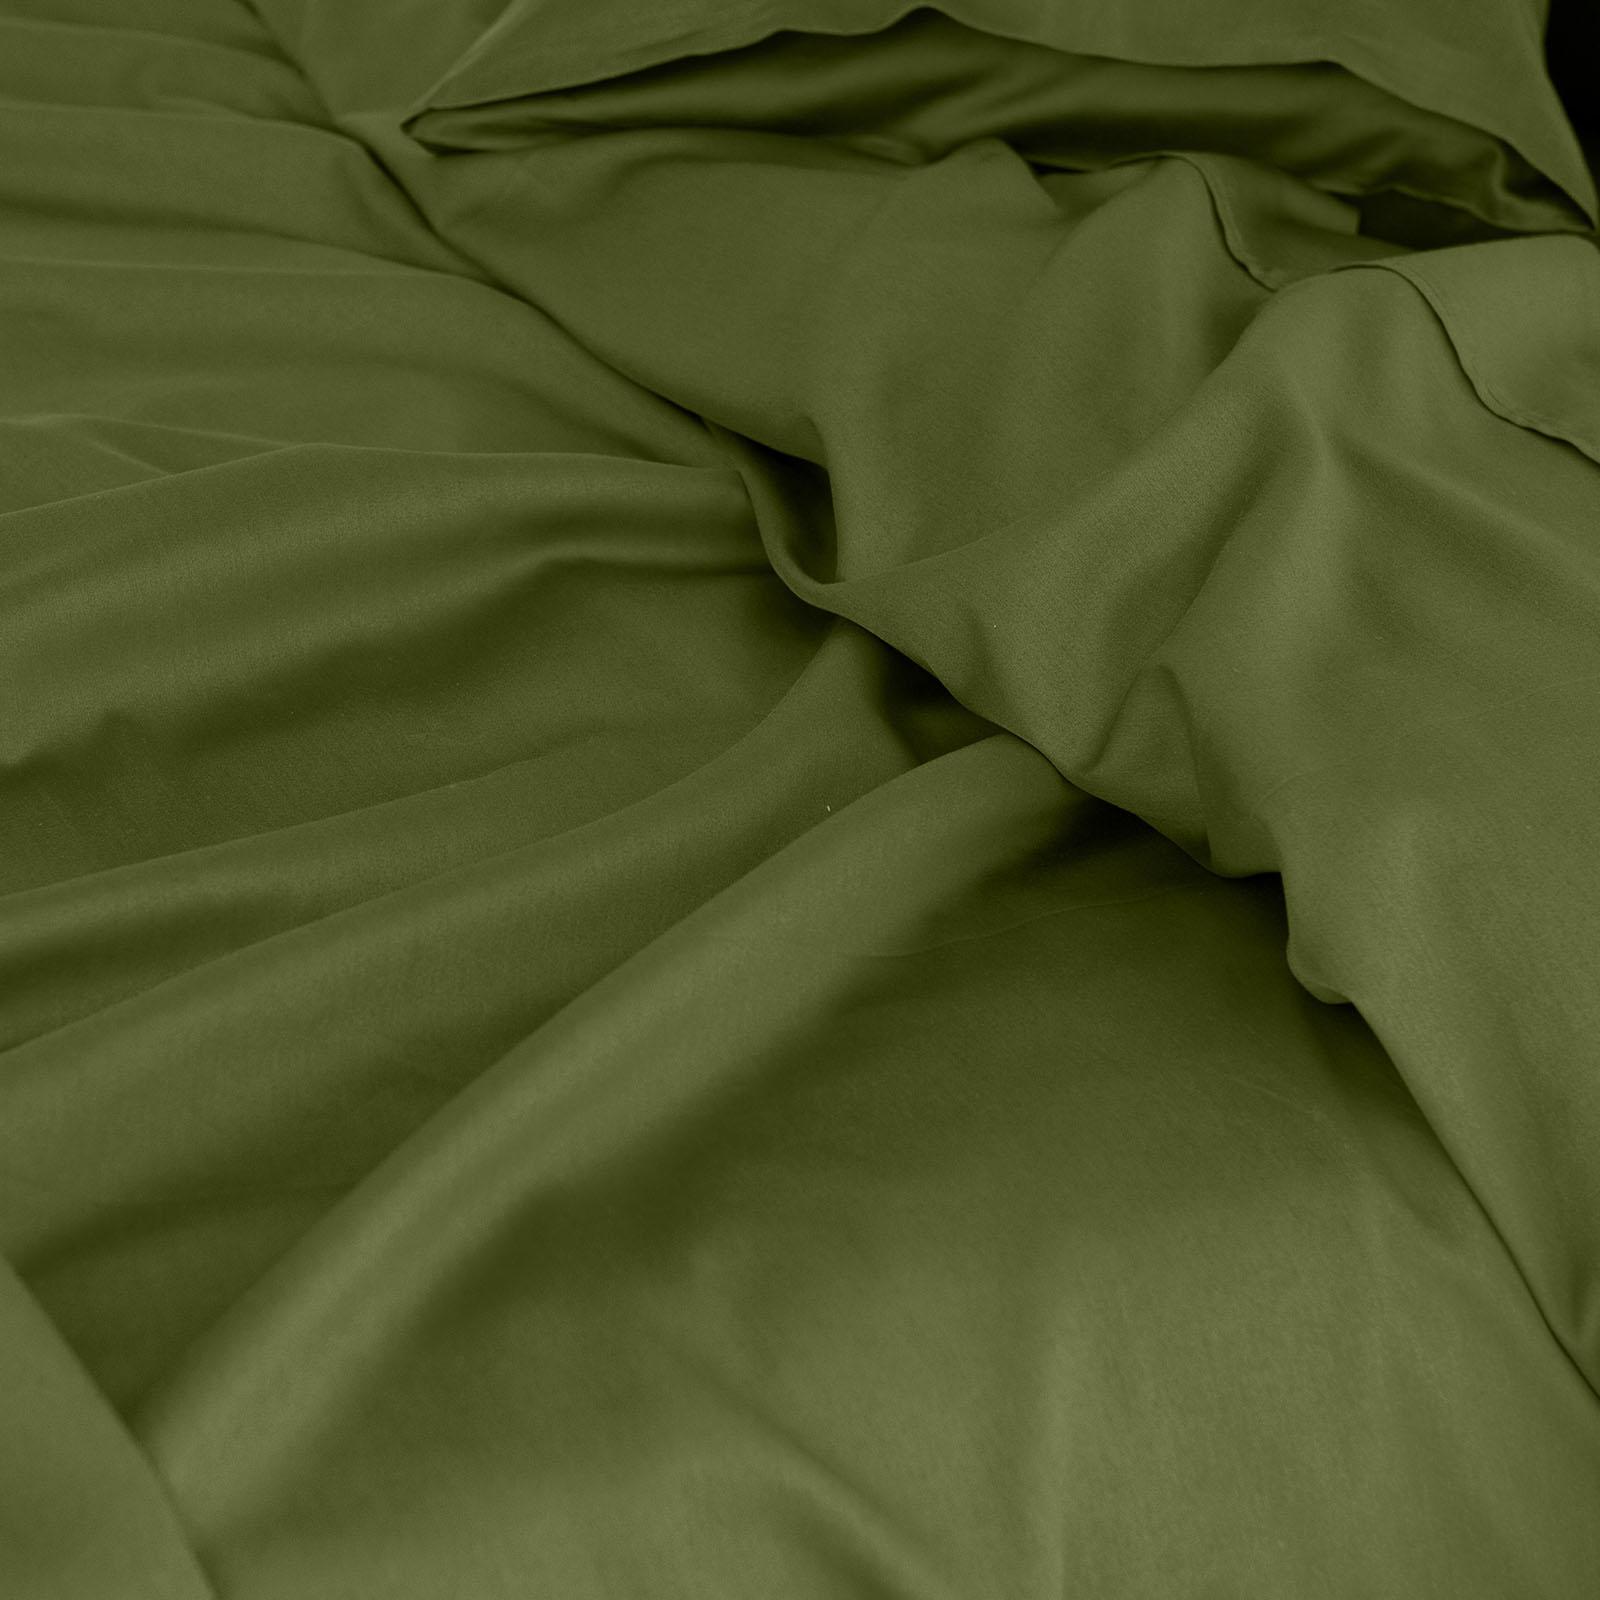 thumbnail 59 - Royal Comfort 1000TC Hotel Grade Bamboo Cotton Sheets Pillowcases Set Ultrasoft